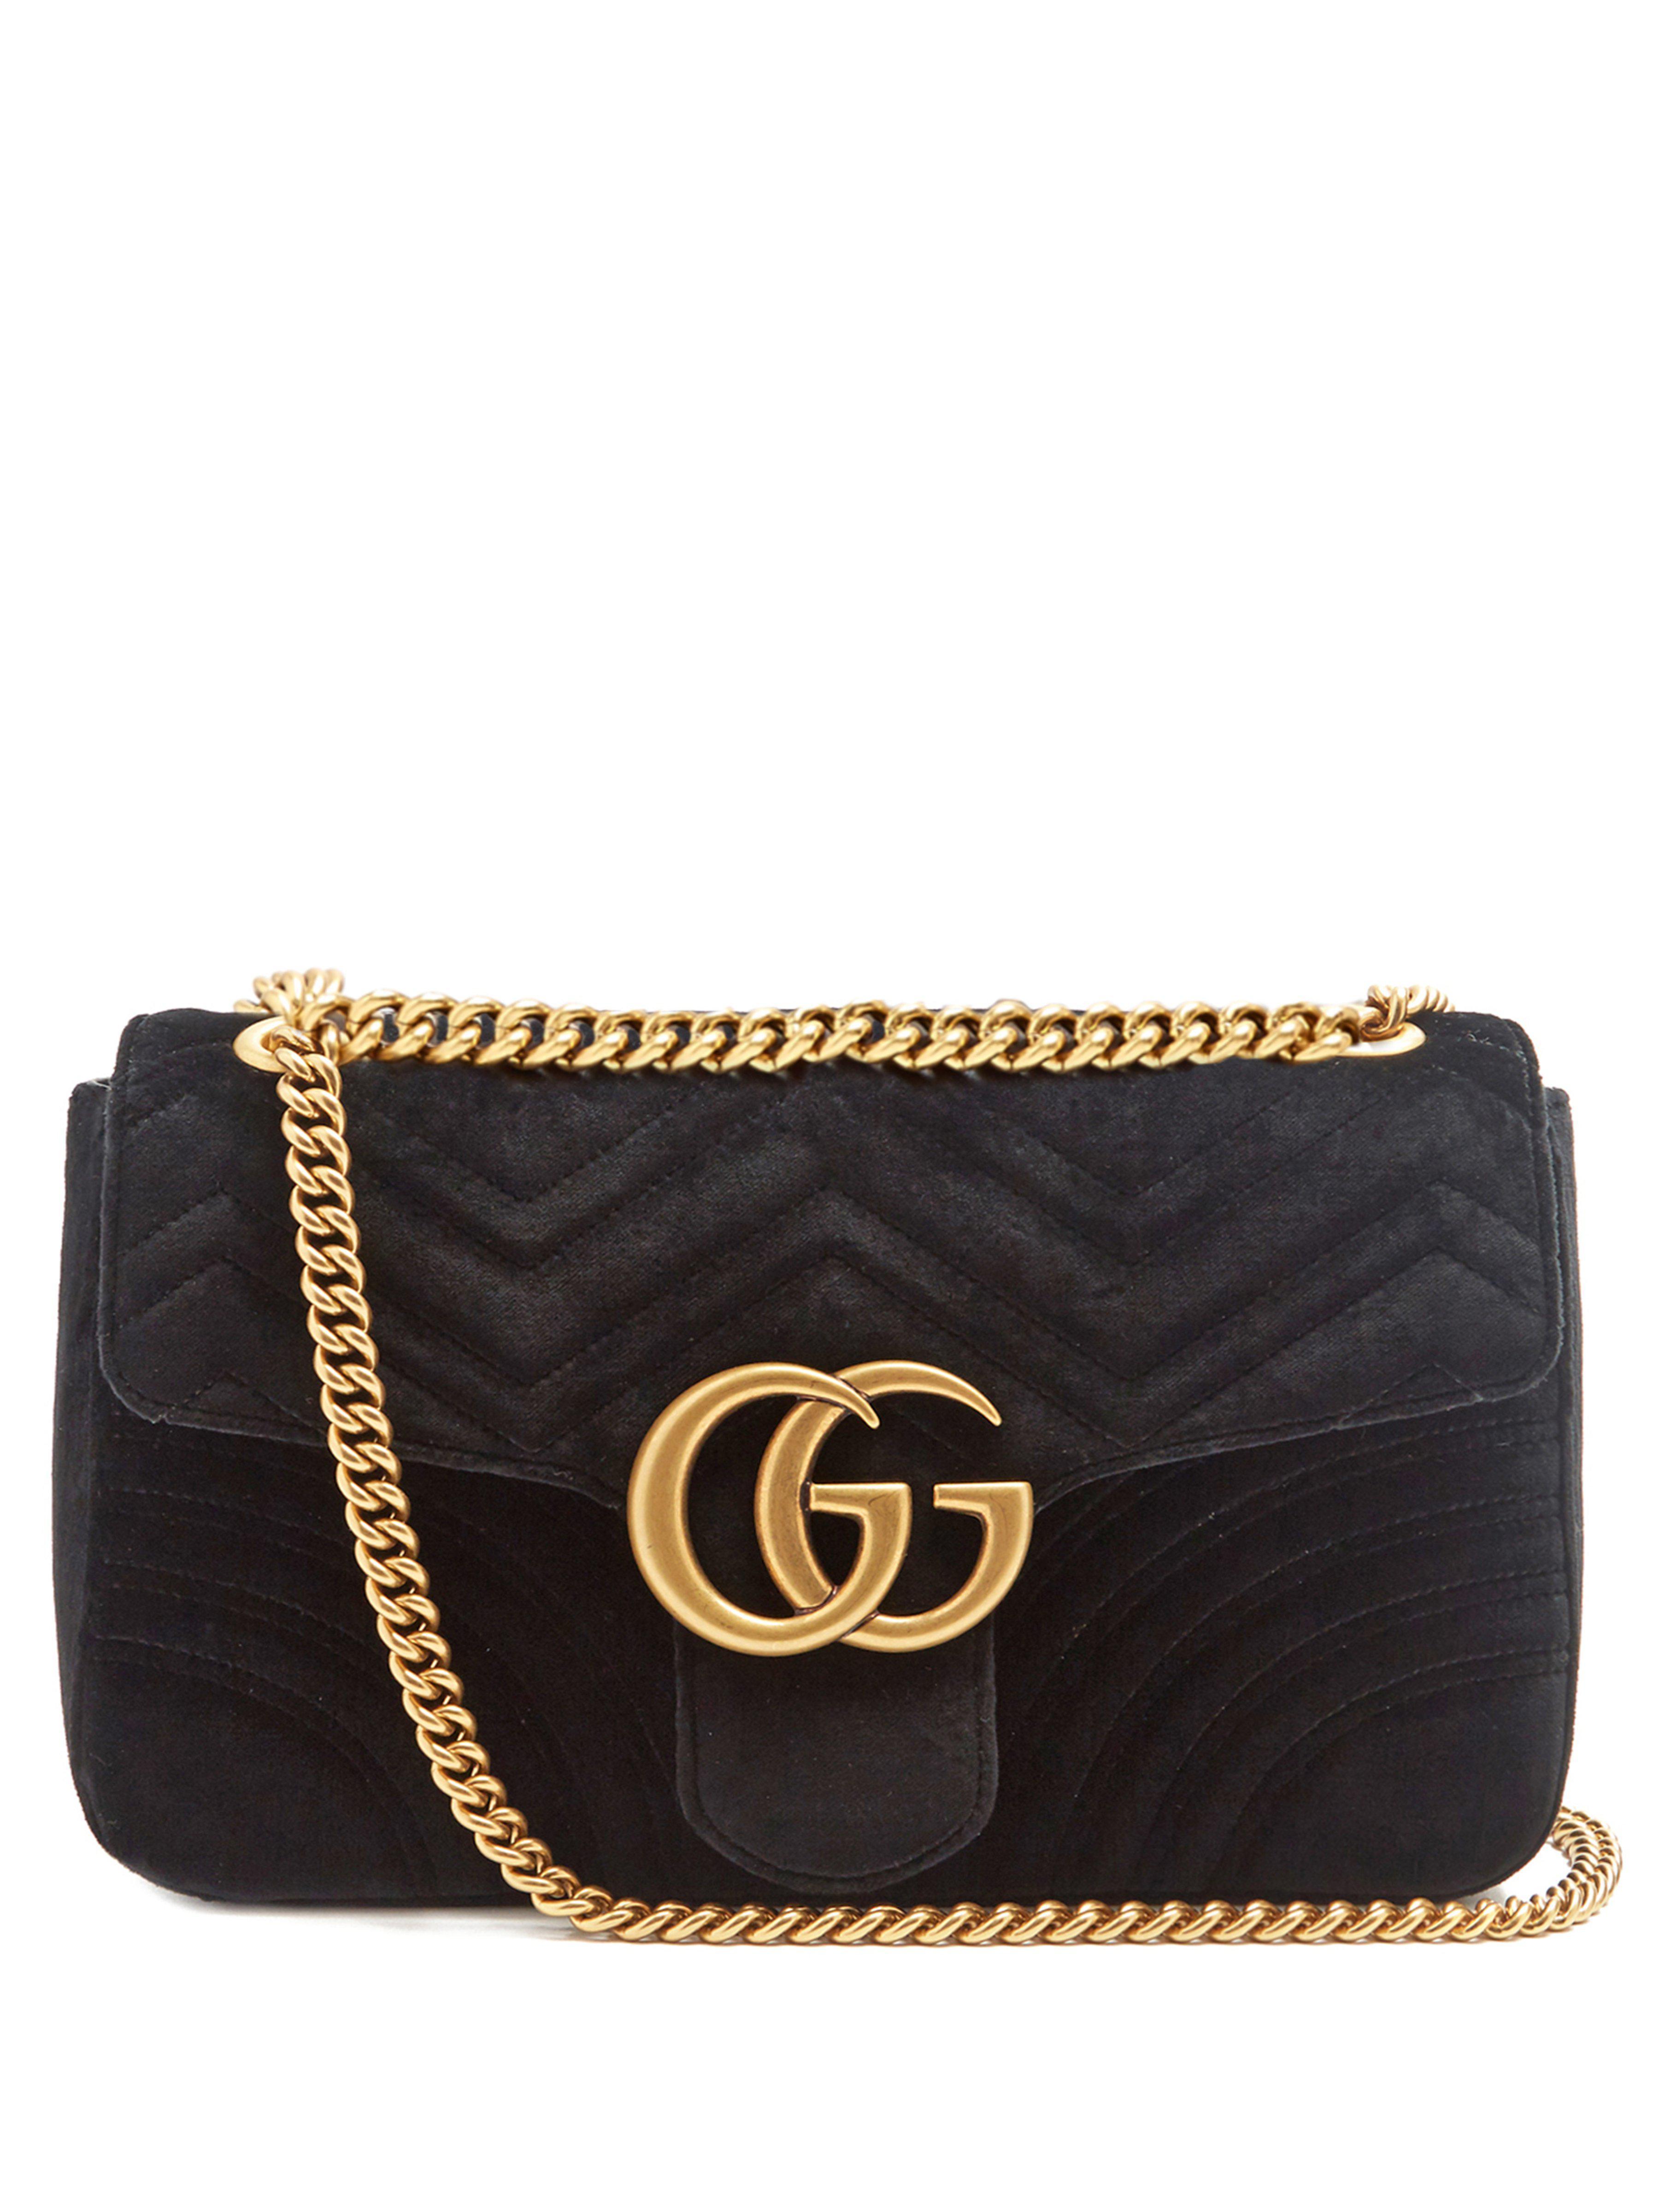 a9f31603458 Gucci Gg Marmont Medium Quilted Velvet Shoulder Bag in Black - Save ...